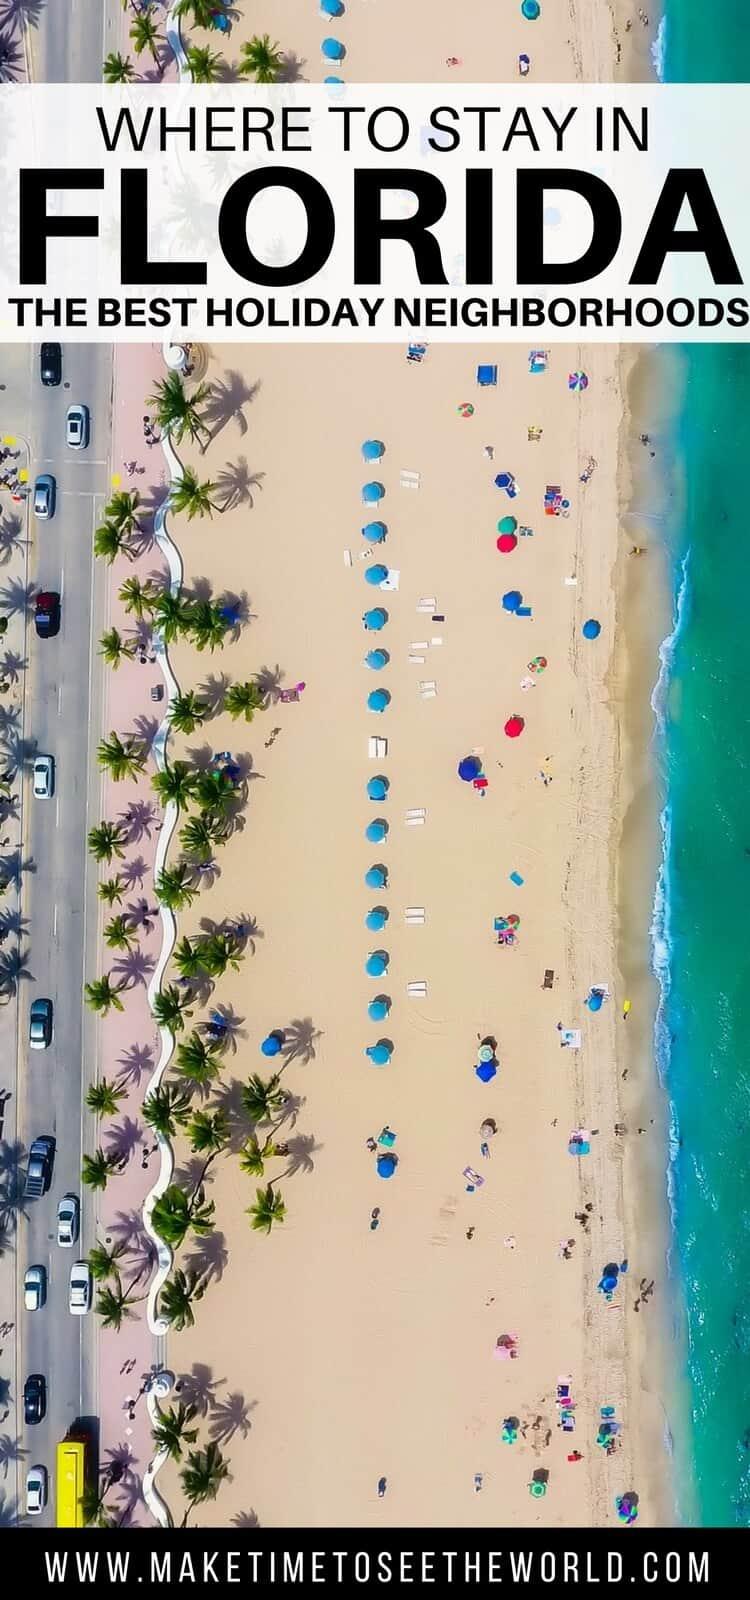 Florida Holiday Neighborhoods